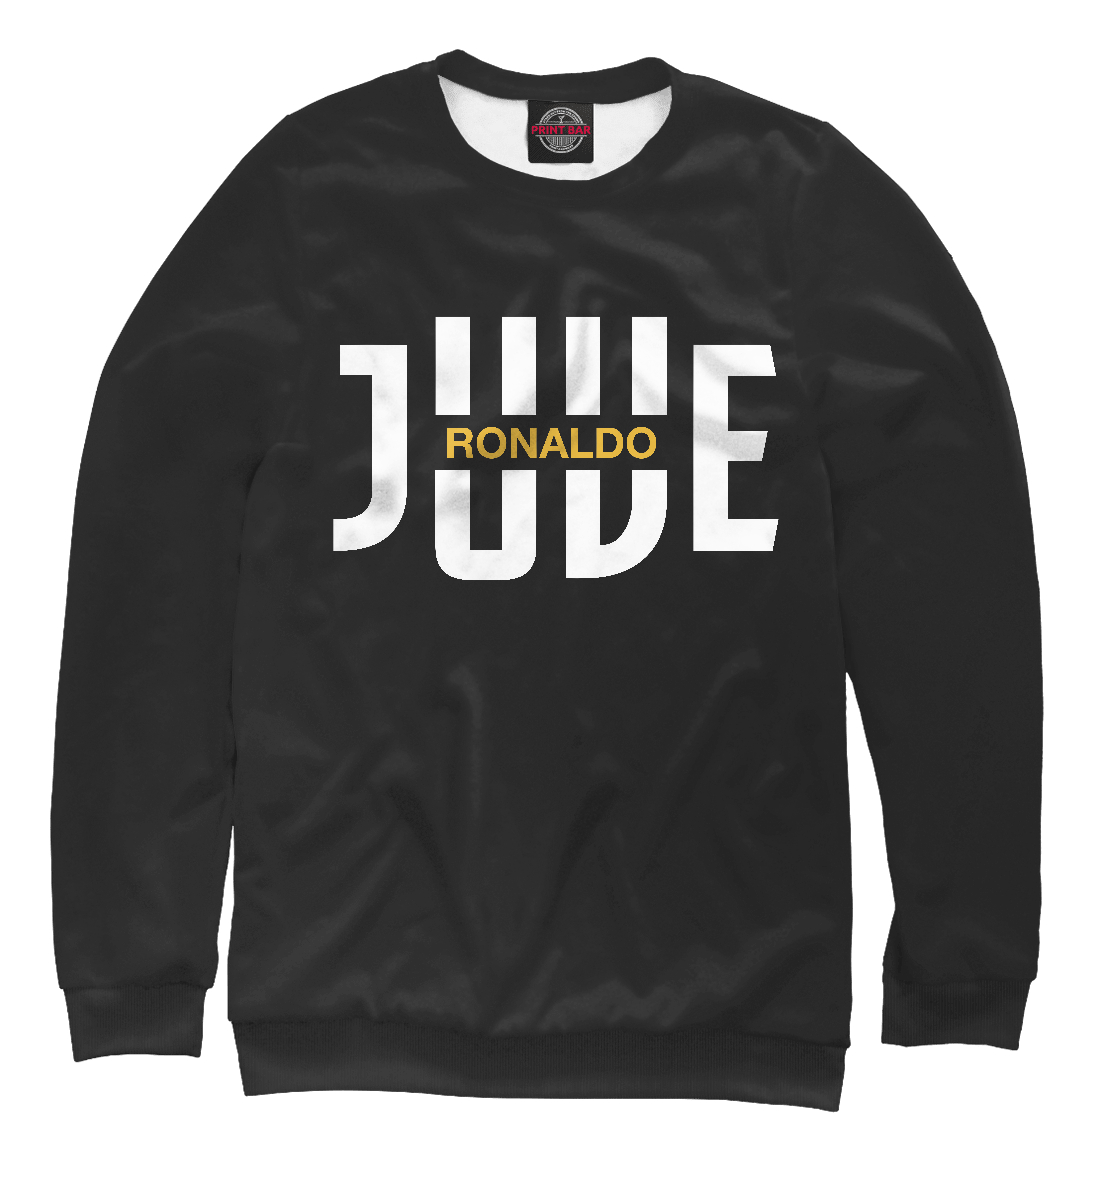 Купить Juventus - Ronaldo, Printbar, Свитшоты, JUV-832555-swi-1